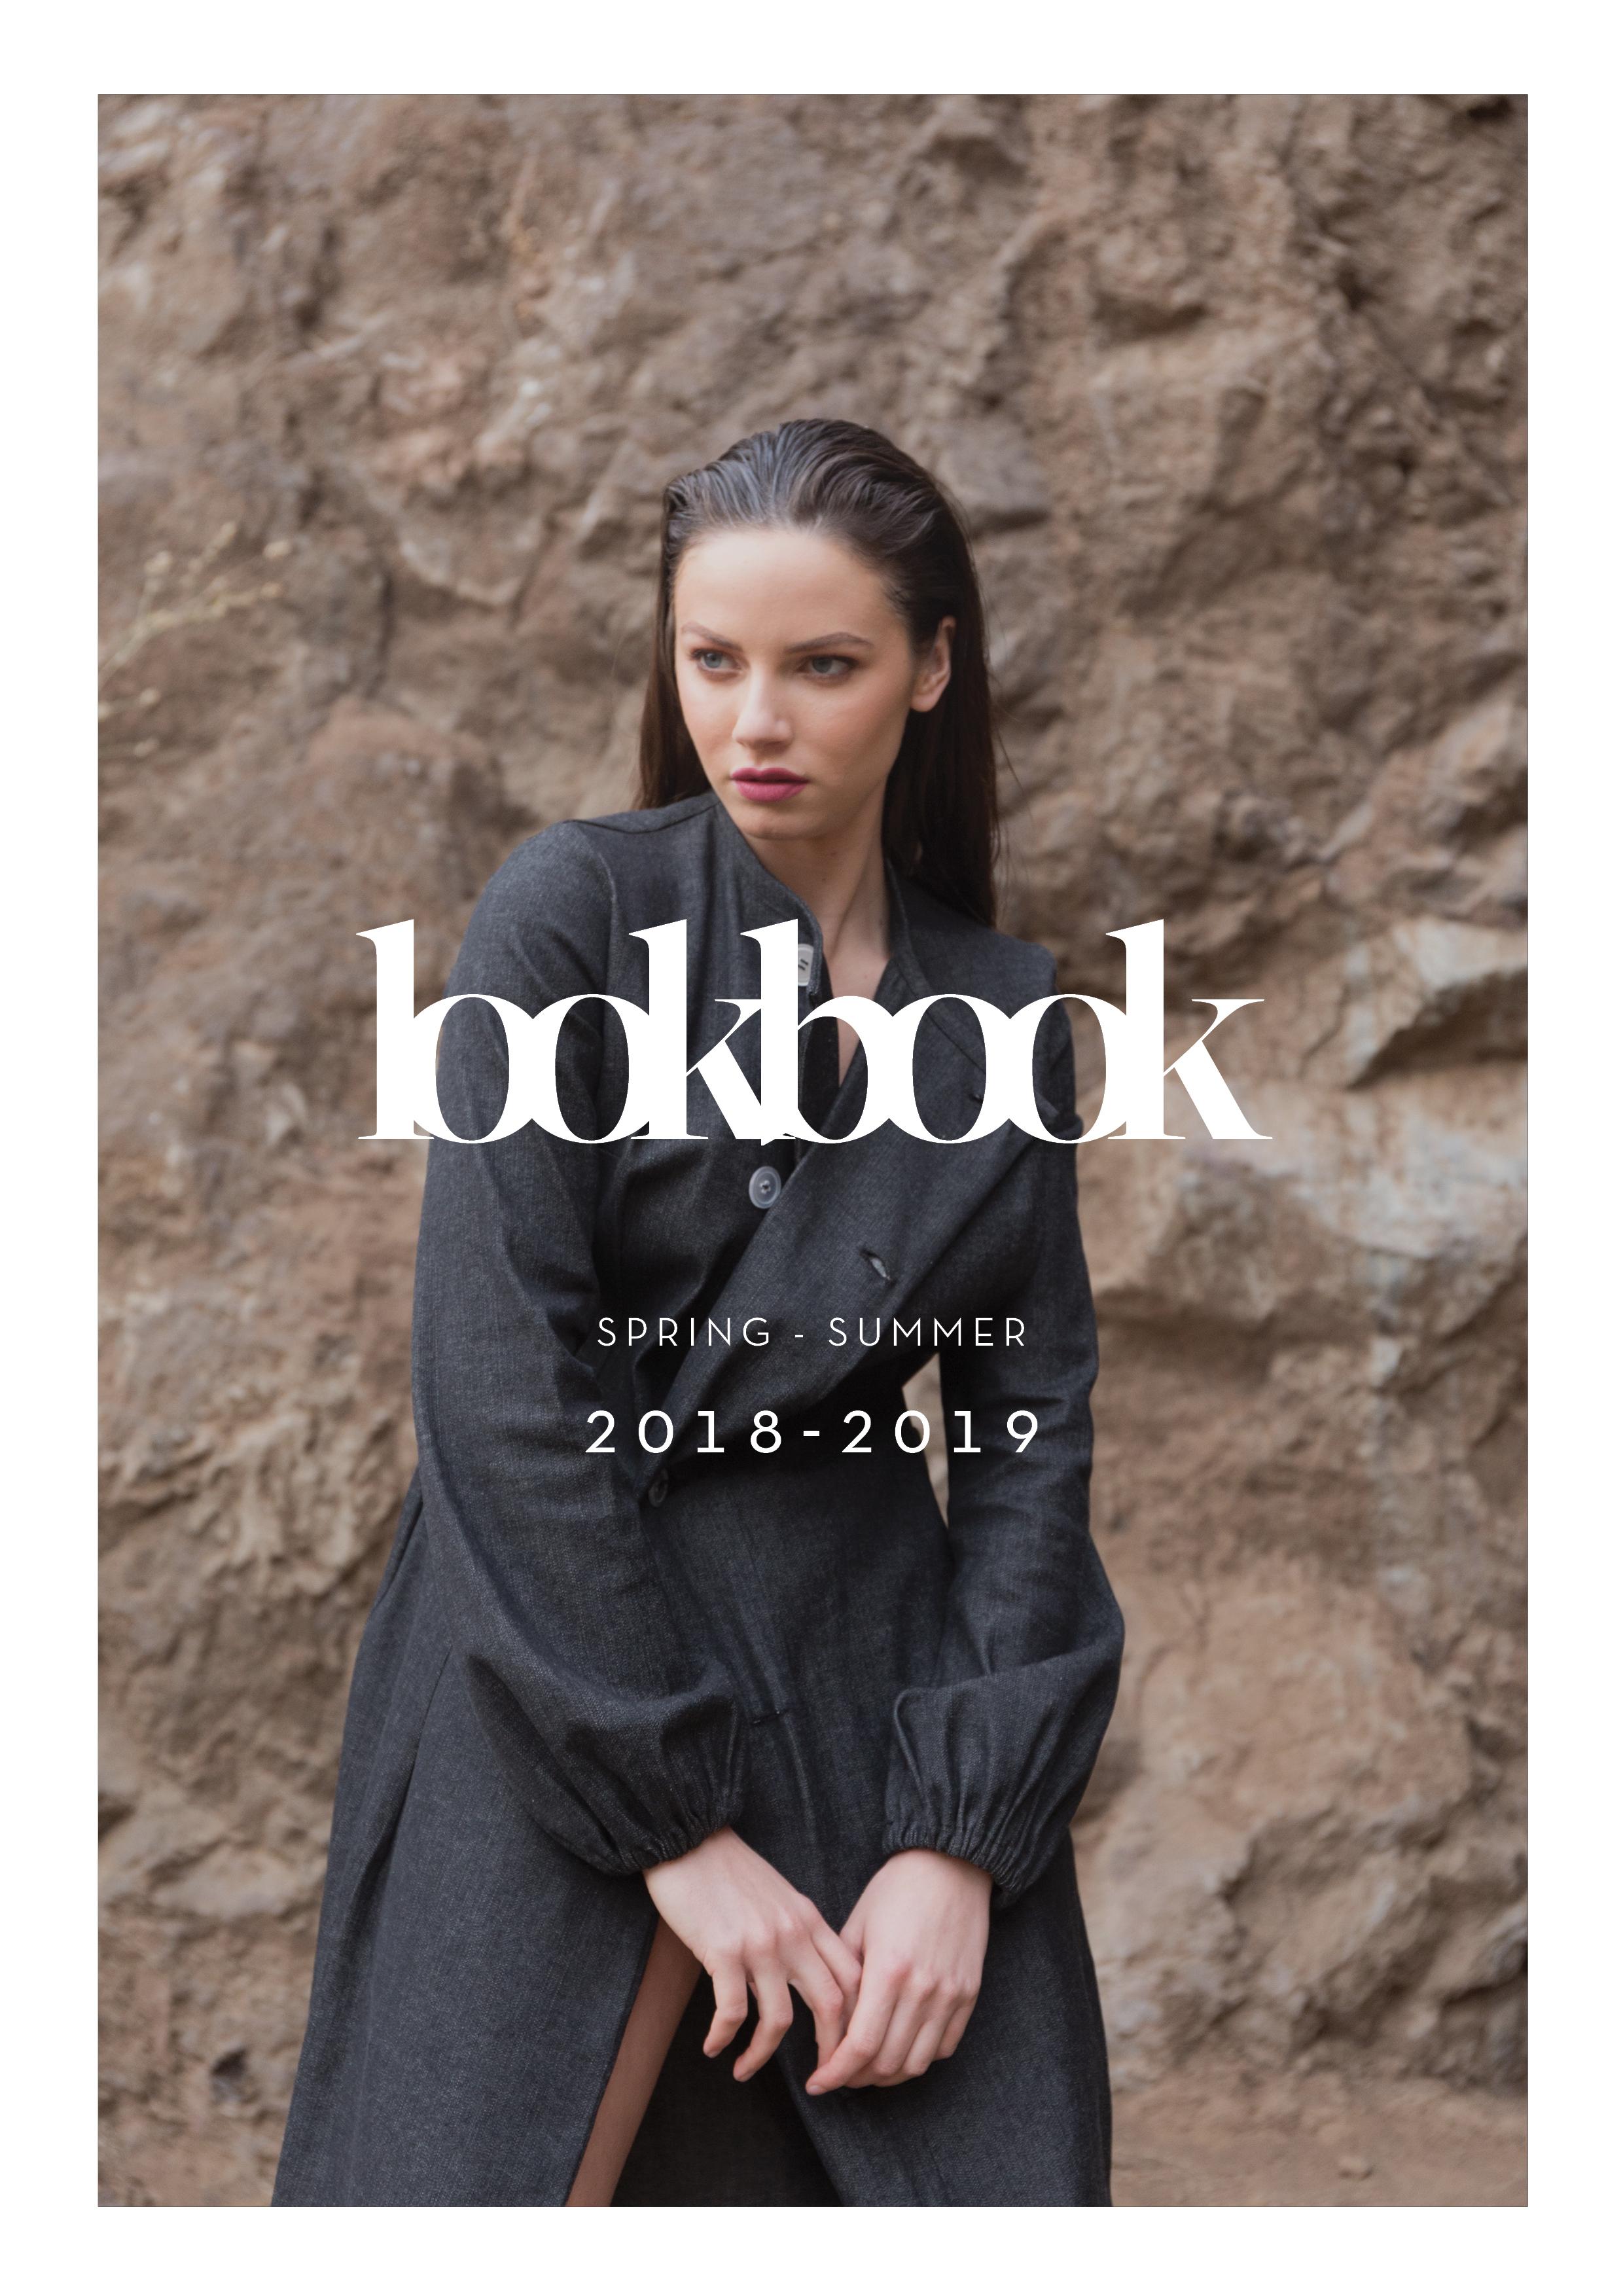 Tiena-Lookbook-Images.jpg